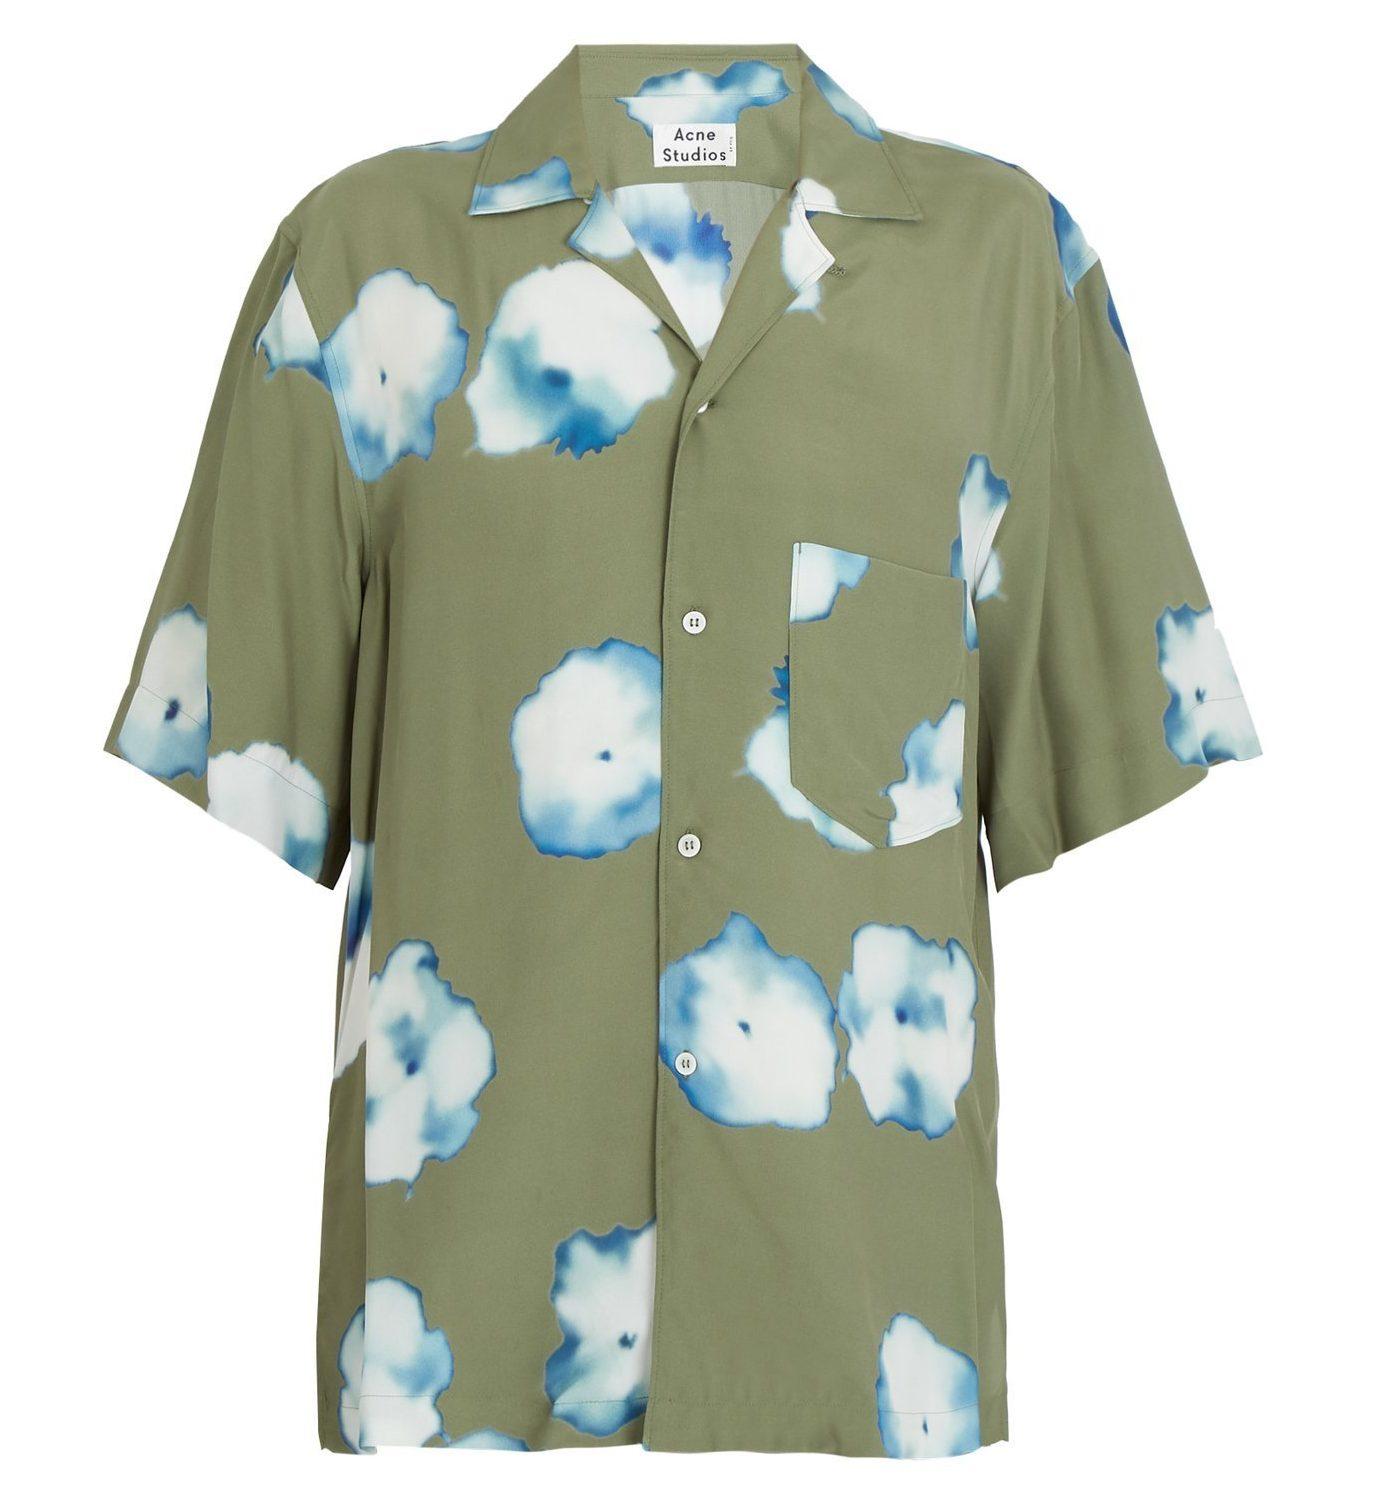 JAL先得CM 夏旅篇で松本潤さん着用の衣装・ACNE STUDIOS Elms short-sleeved floral-print shirt